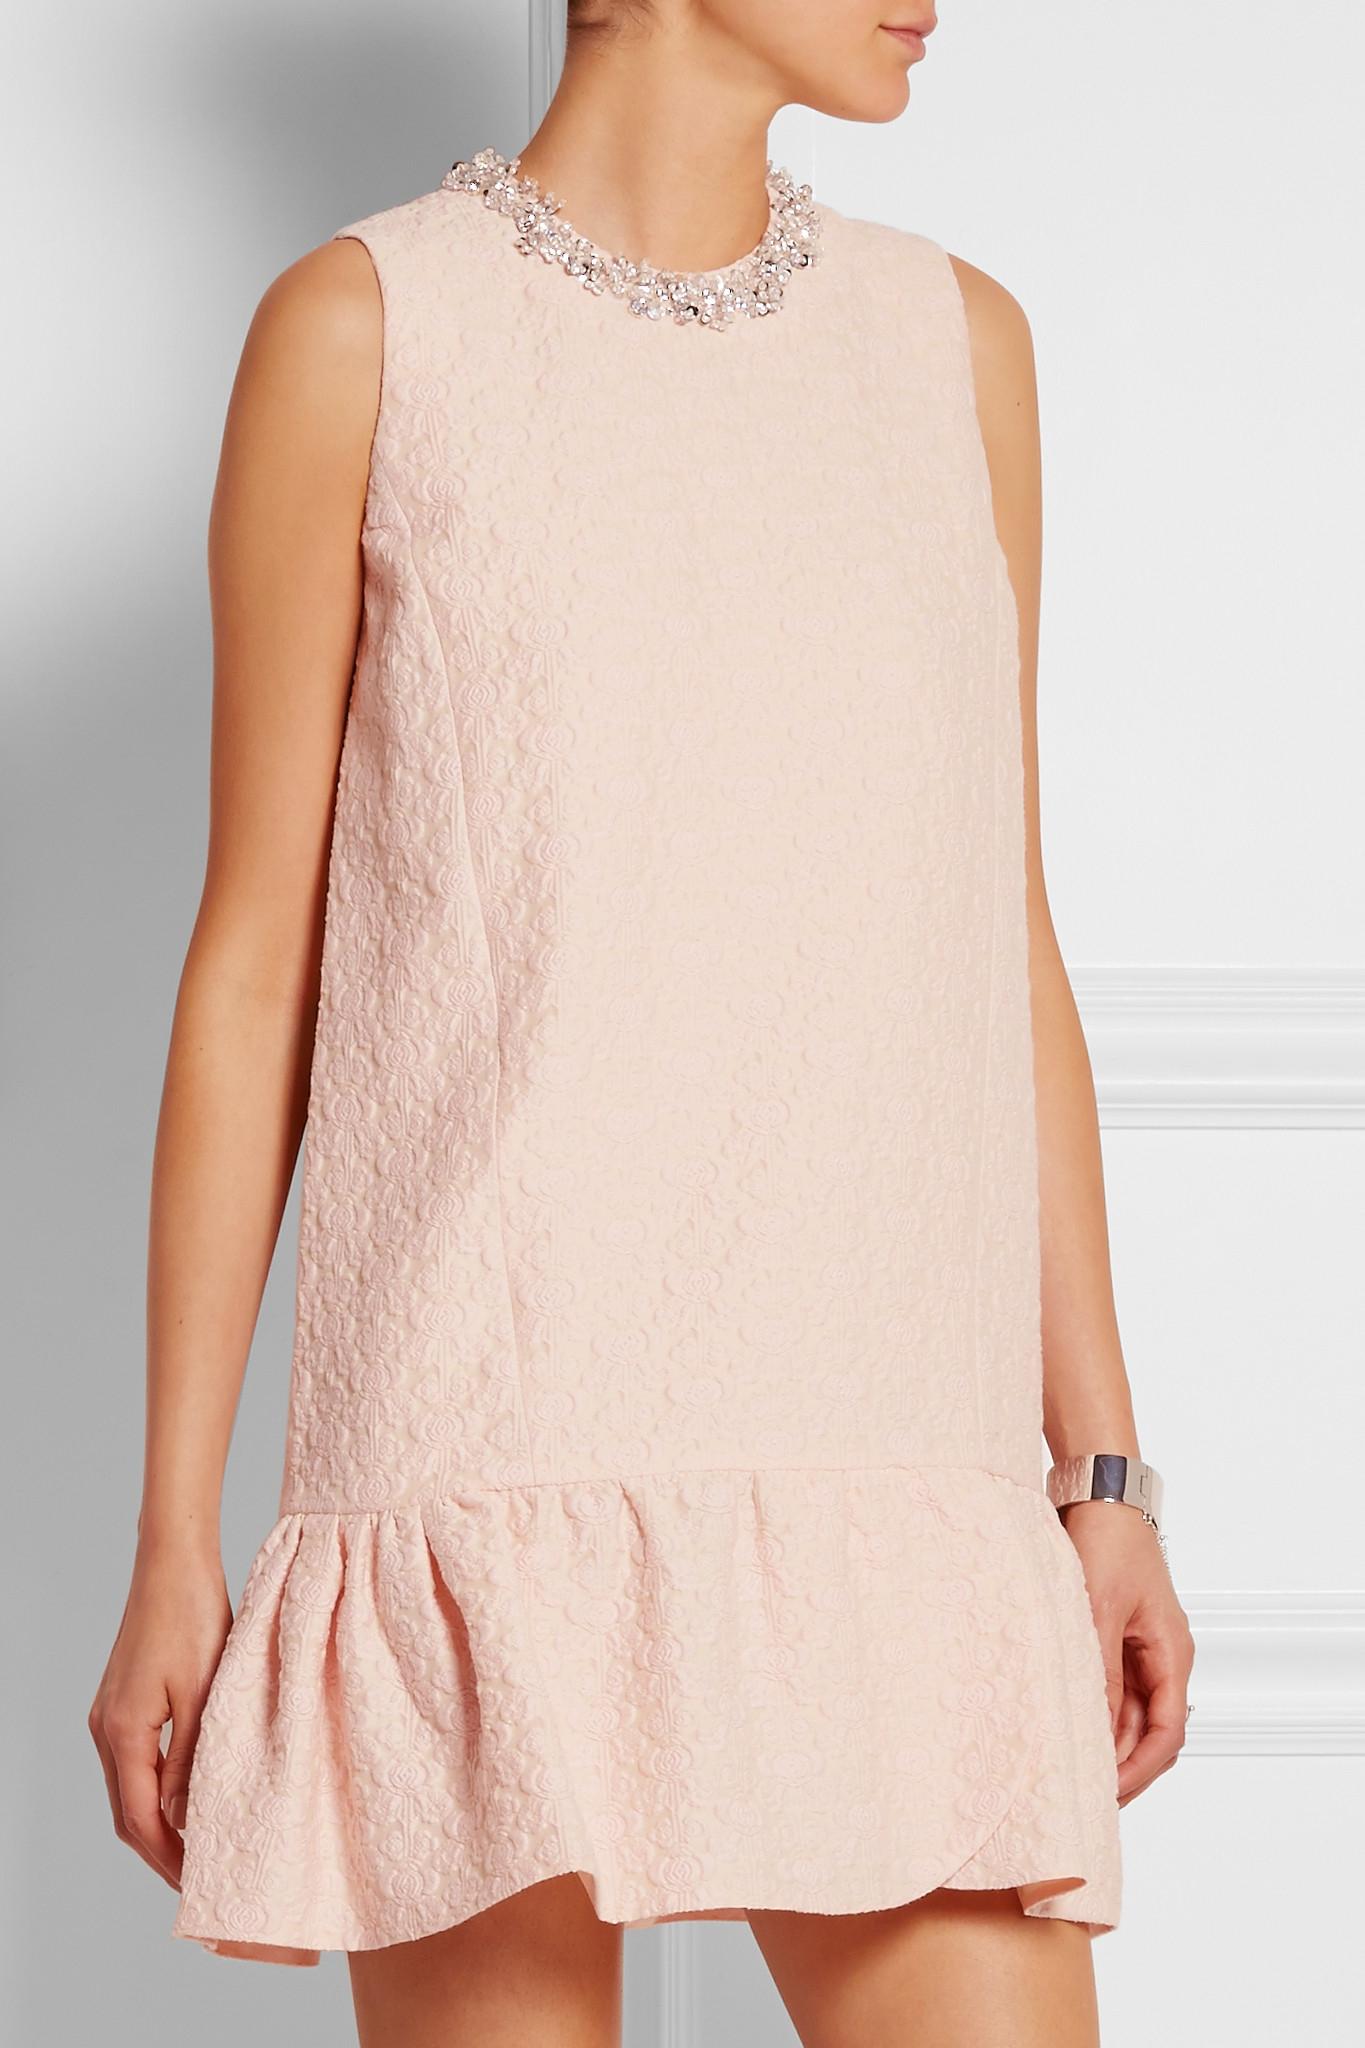 Miu Miu Embellished Cotton Blend Jacquard Mini Dress In